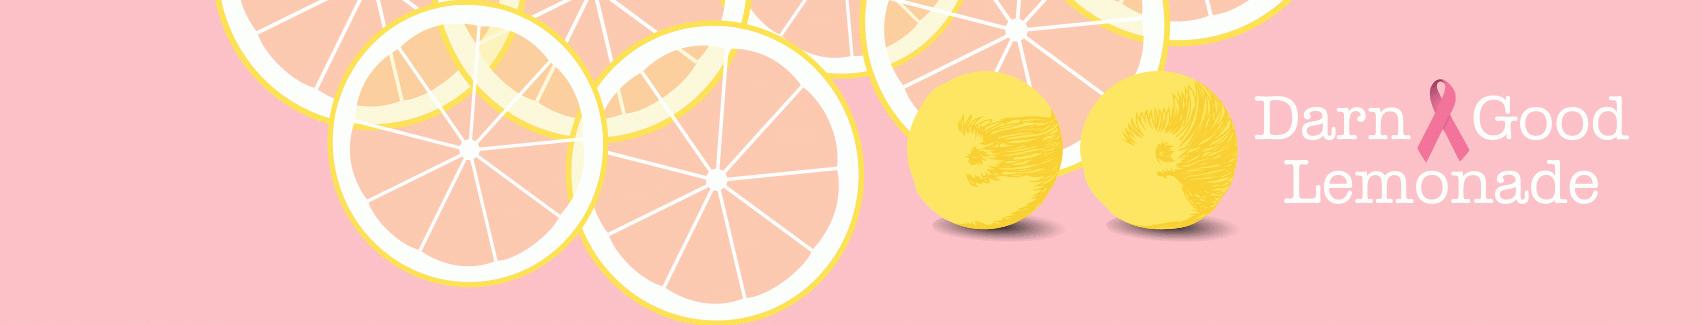 Darn Good Lemonade